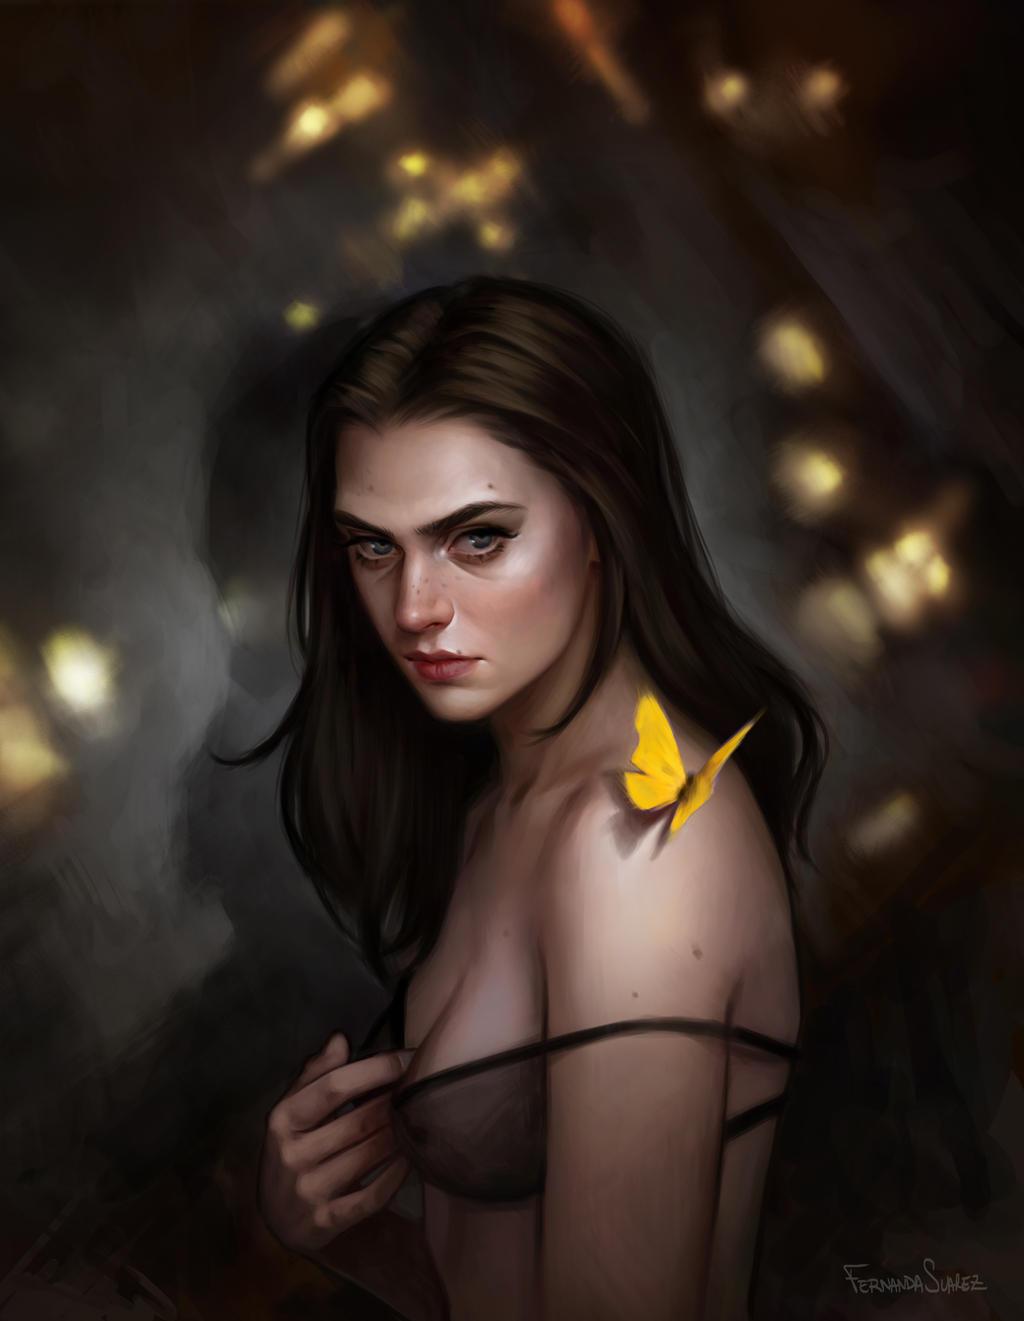 Burn on the edge by fdasuarez